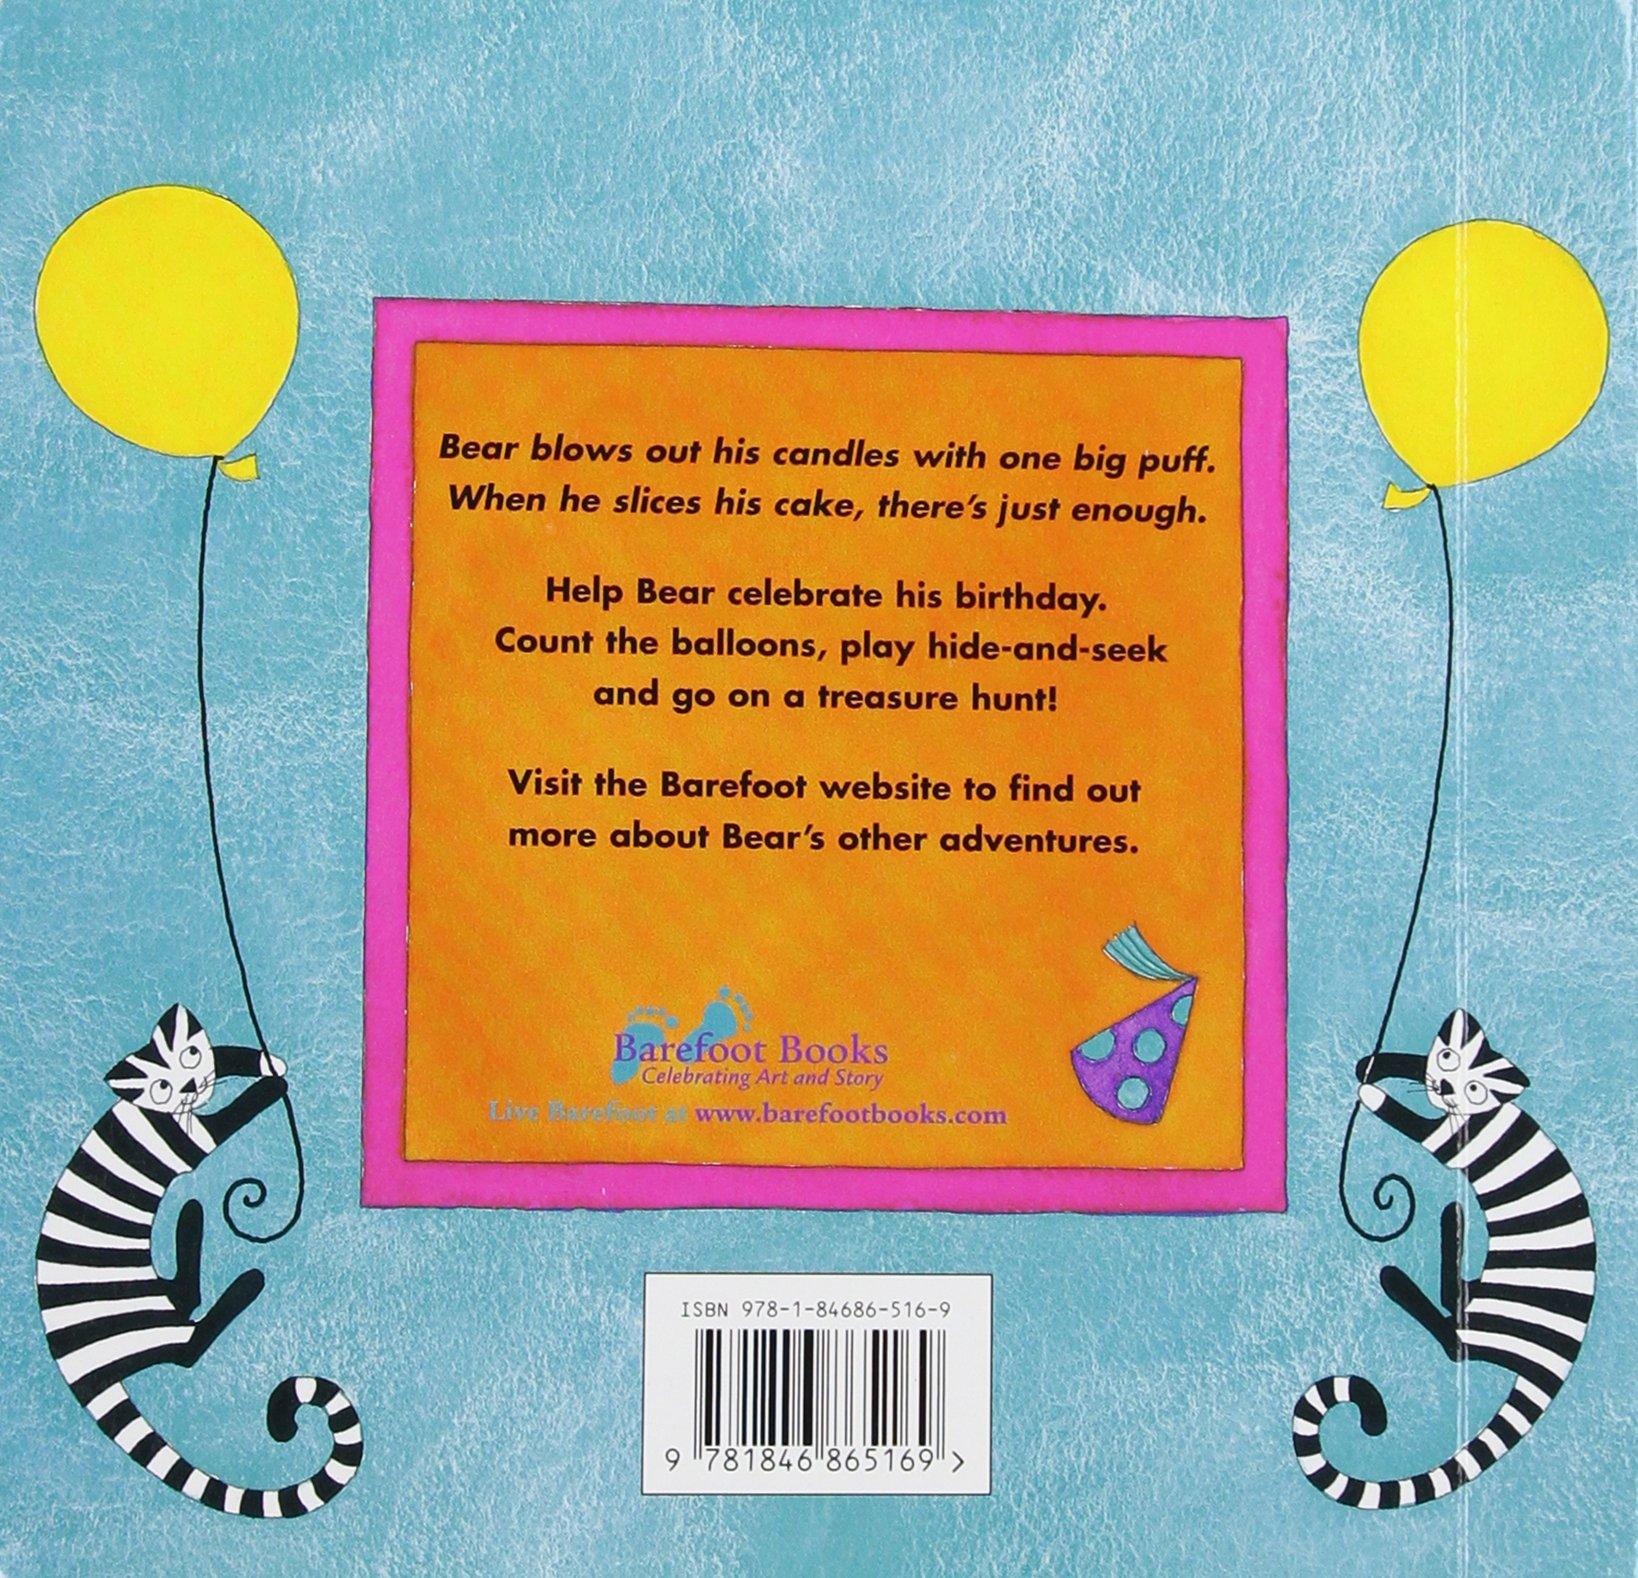 Bear's Birthday: Amazon.co.uk: Stella Blackstone, Debbie Harter:  9781846865169: Books